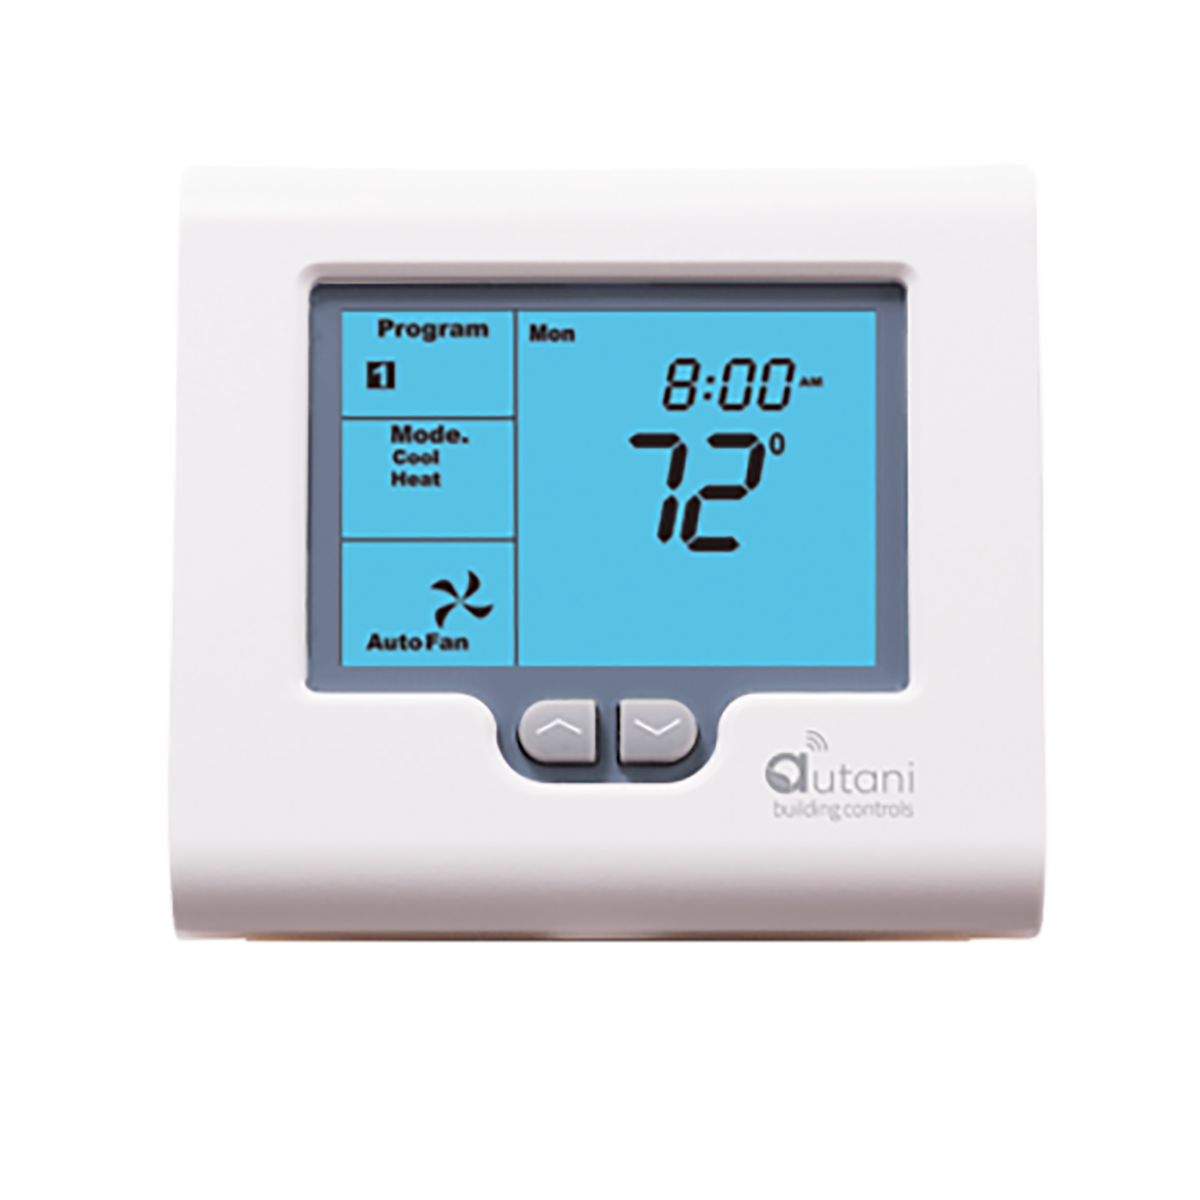 Autani-Thermostat-T32P